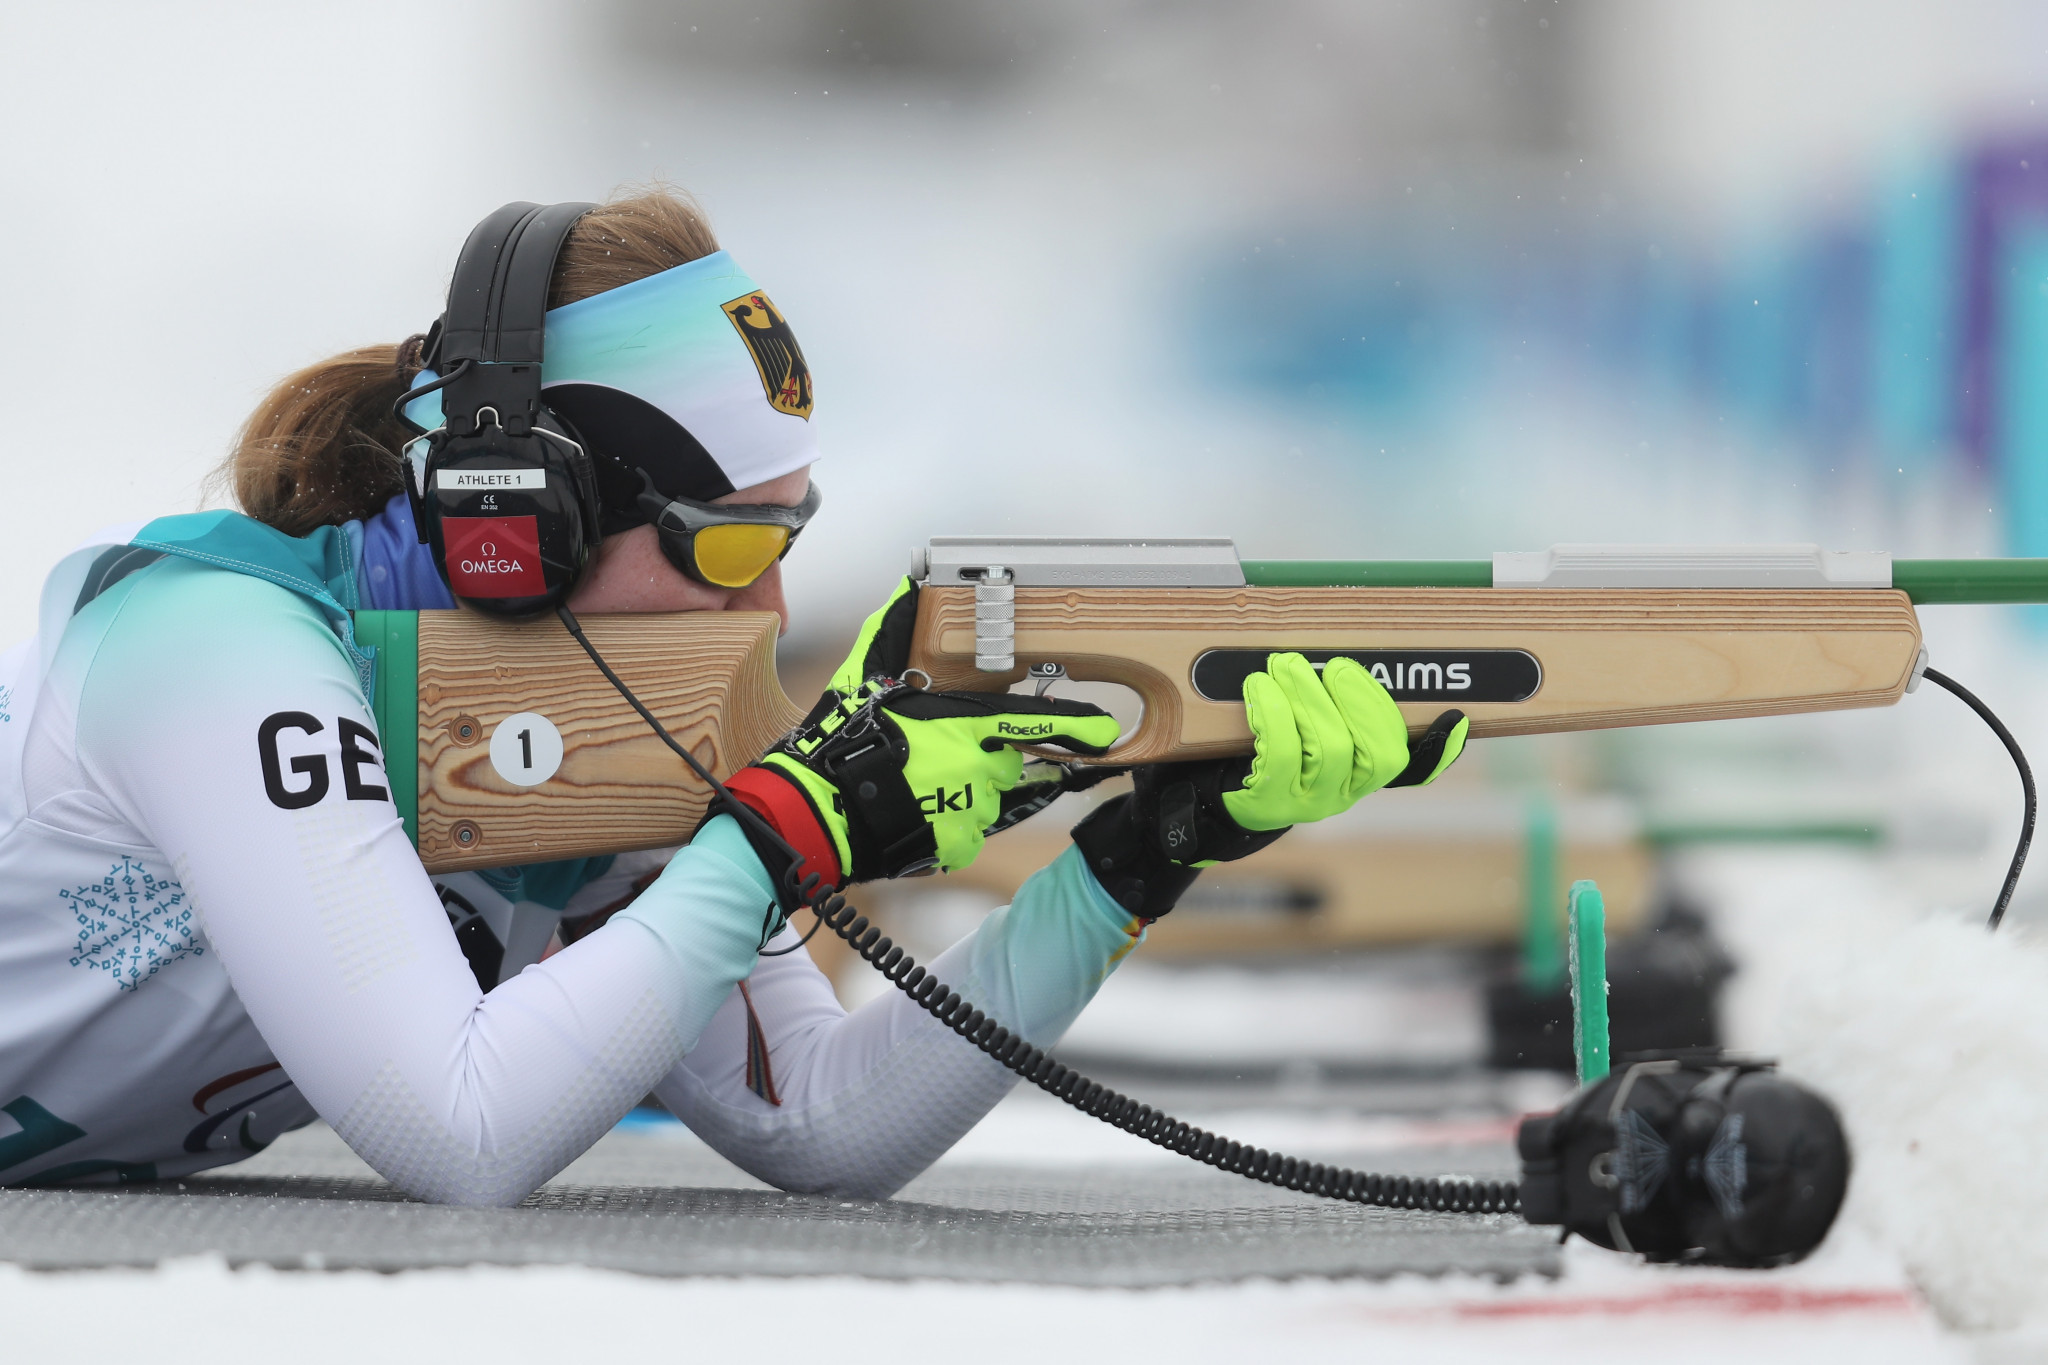 World Para Snow Sports announces deal with biathlon supplier Ecoaims